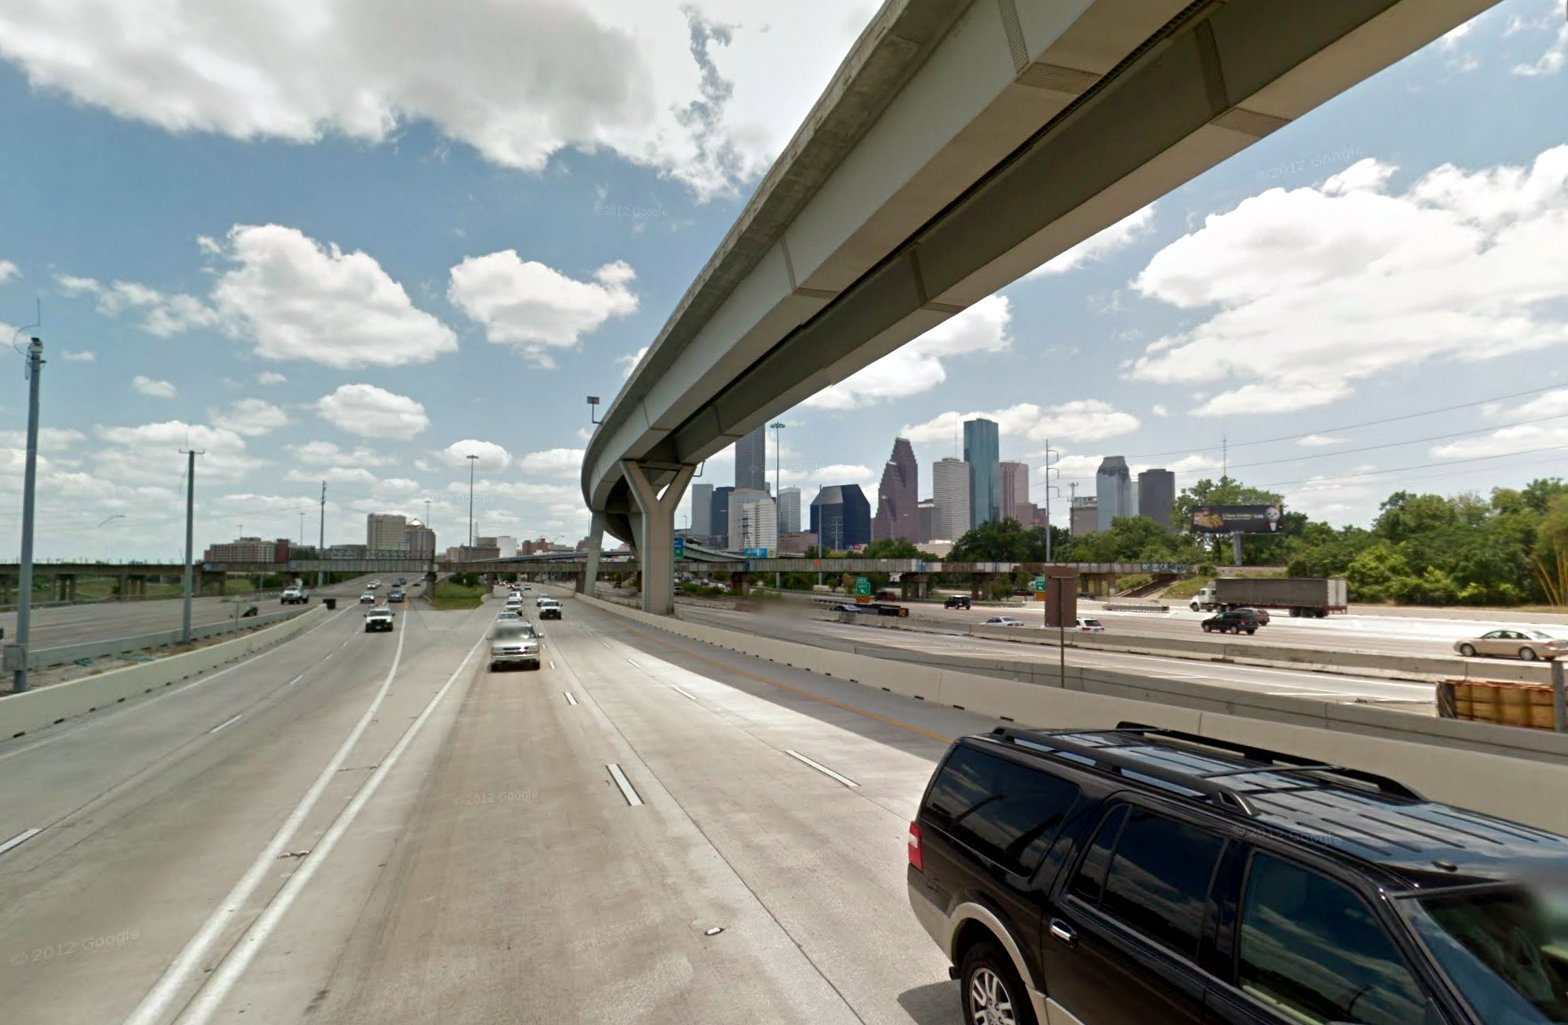 too big for texas  houston u0026 39 s 23-lane freeway